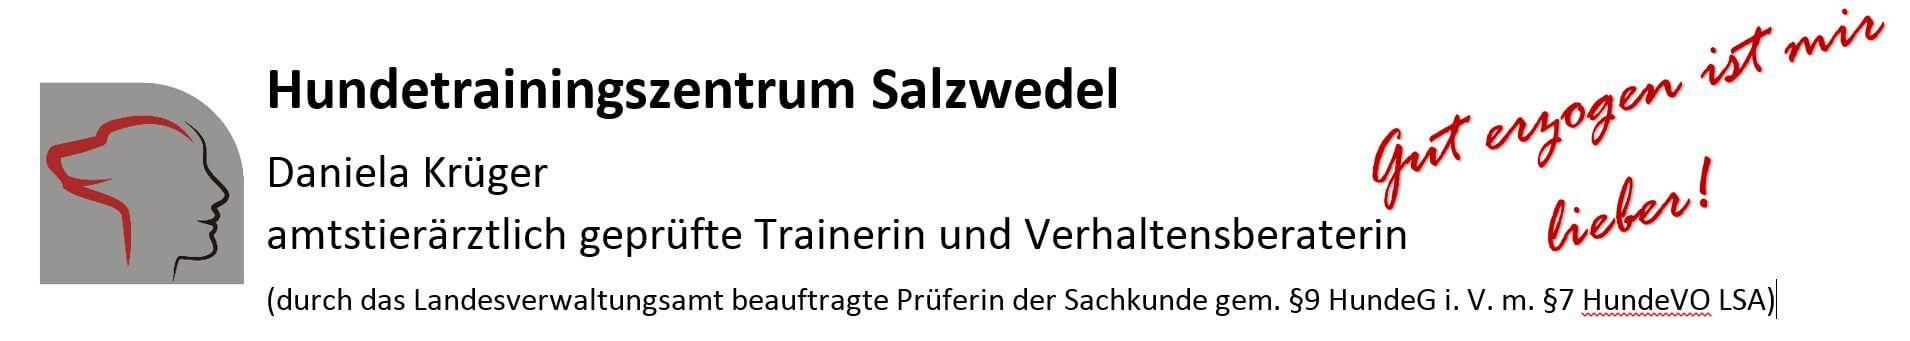 Hundeschule Salzwedel